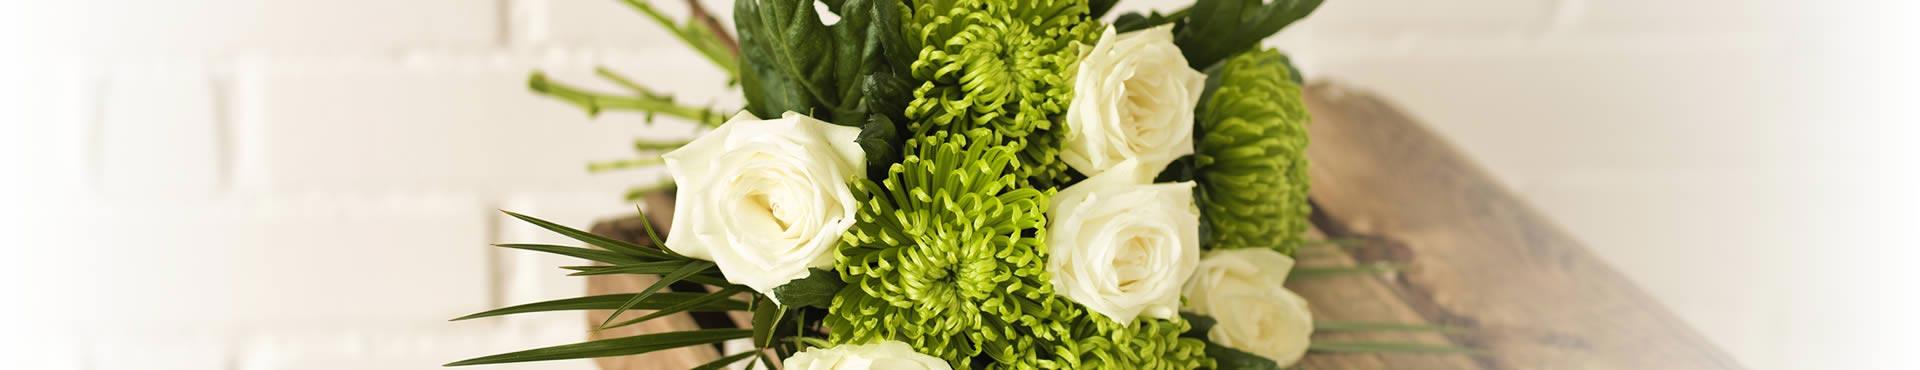 Send blomster som kondolence